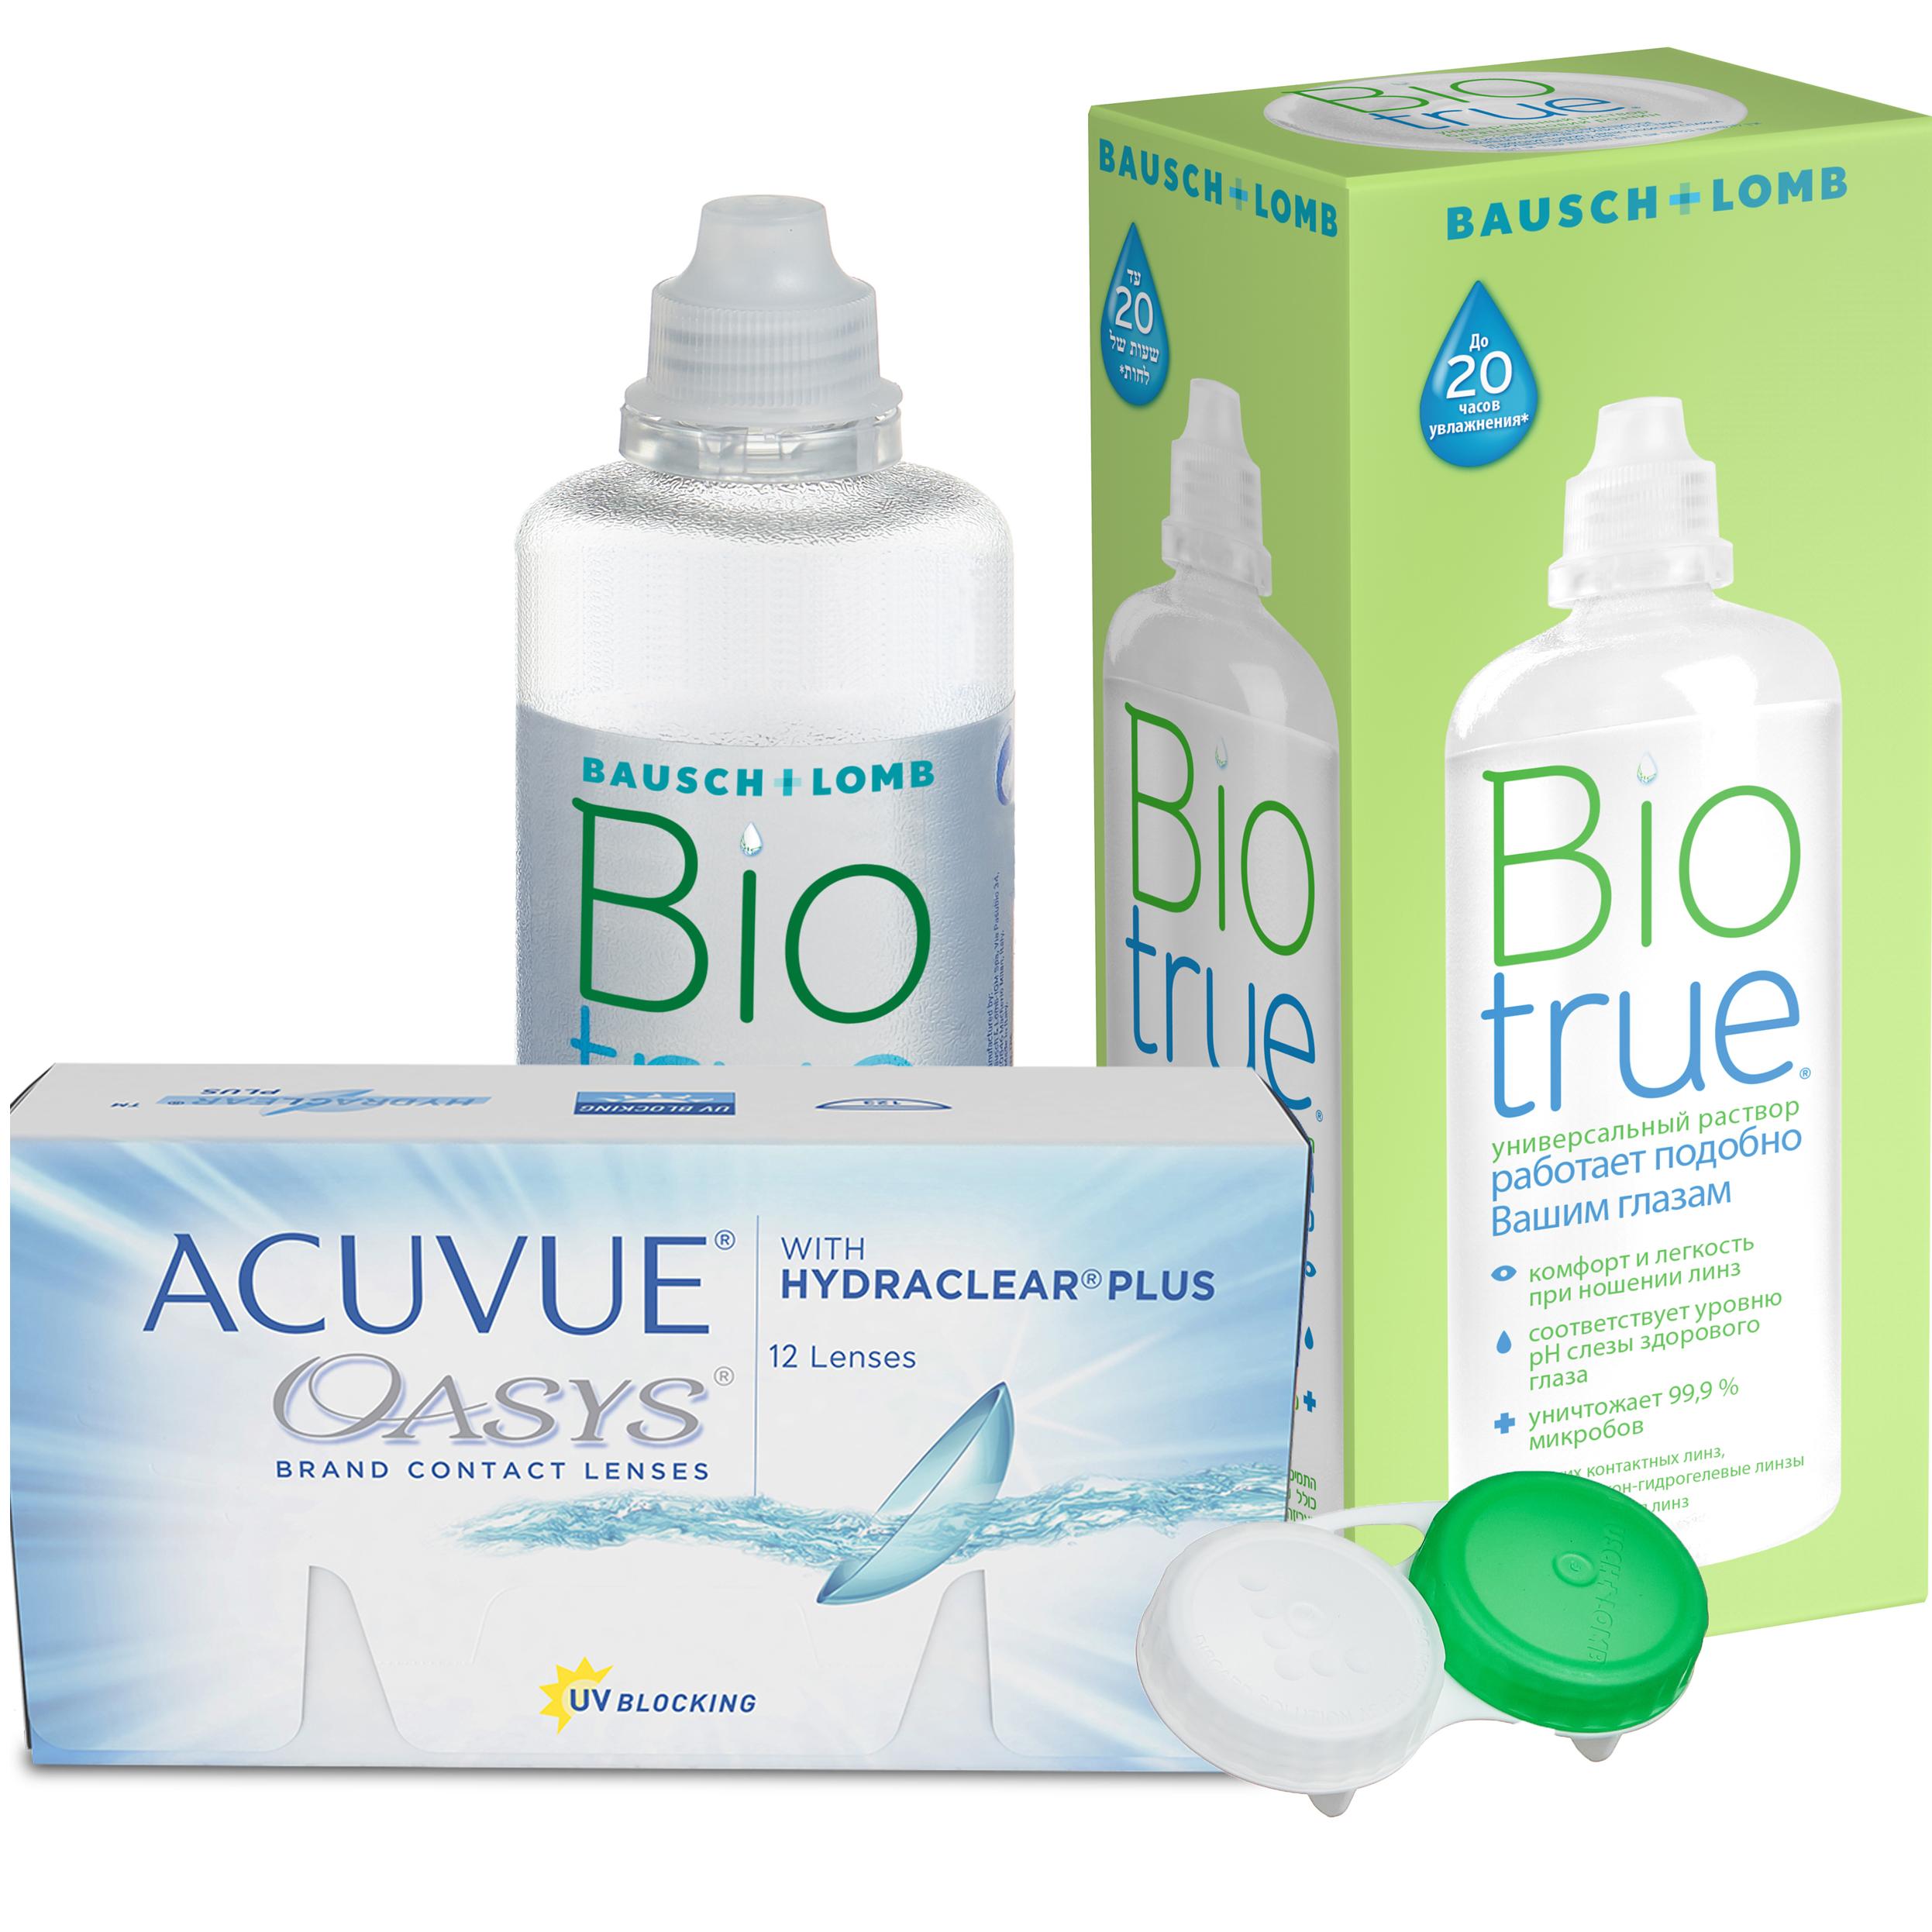 Купить Oasys with Hydraclear Plus 12 линз + Biotrue, Контактные линзы Acuvue Oasys with Hydraclear Plus 12 линз R 8.4 +1, 50 + Biotrue 300 мл